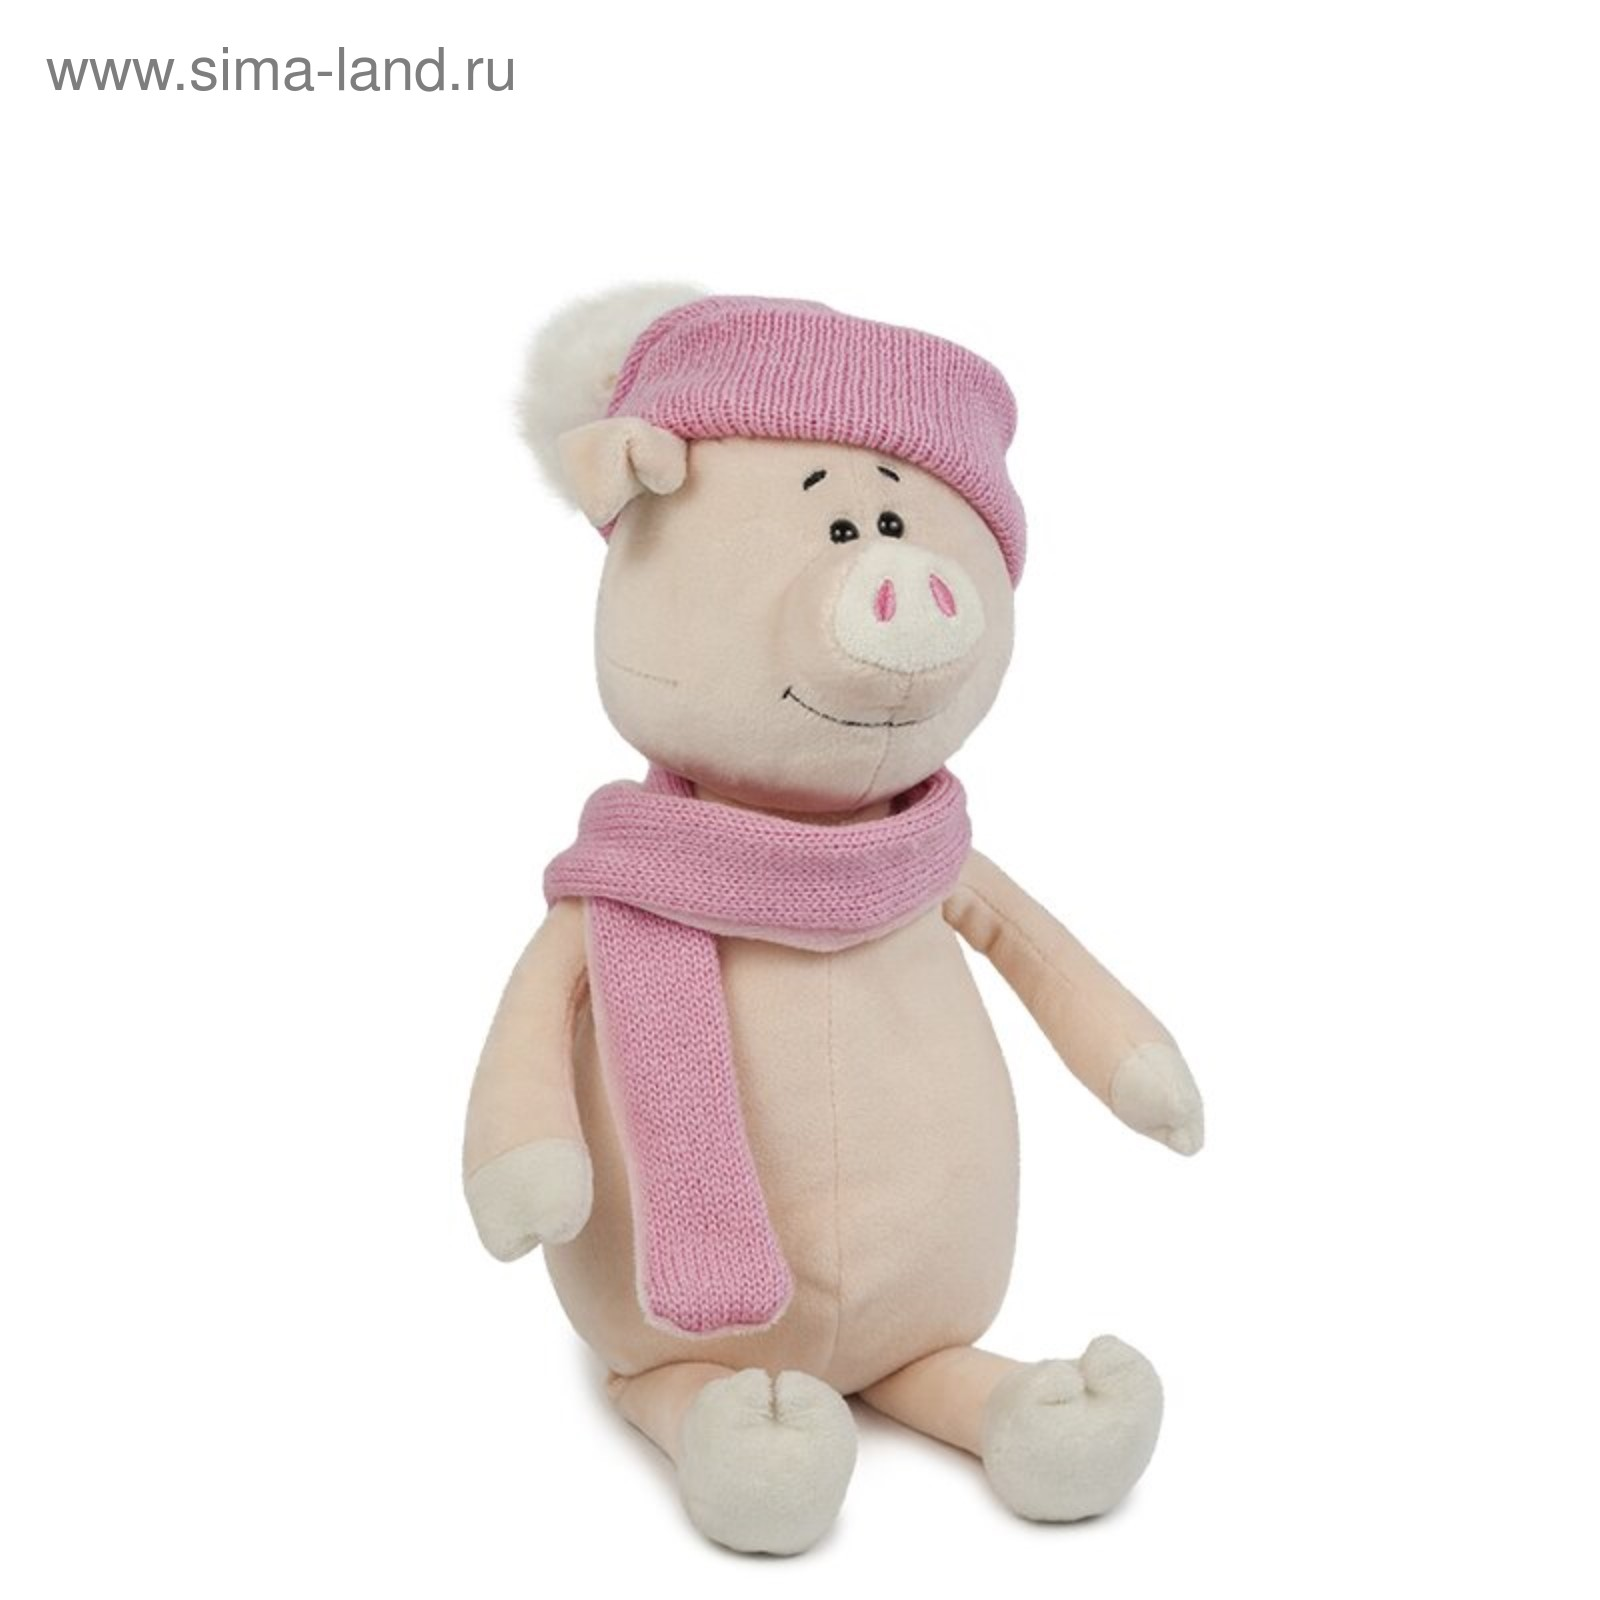 Мягкая игрушка «Свинка Глаша» в шапке и шарфе, 28 см (3851177 ... b419f93d9e0